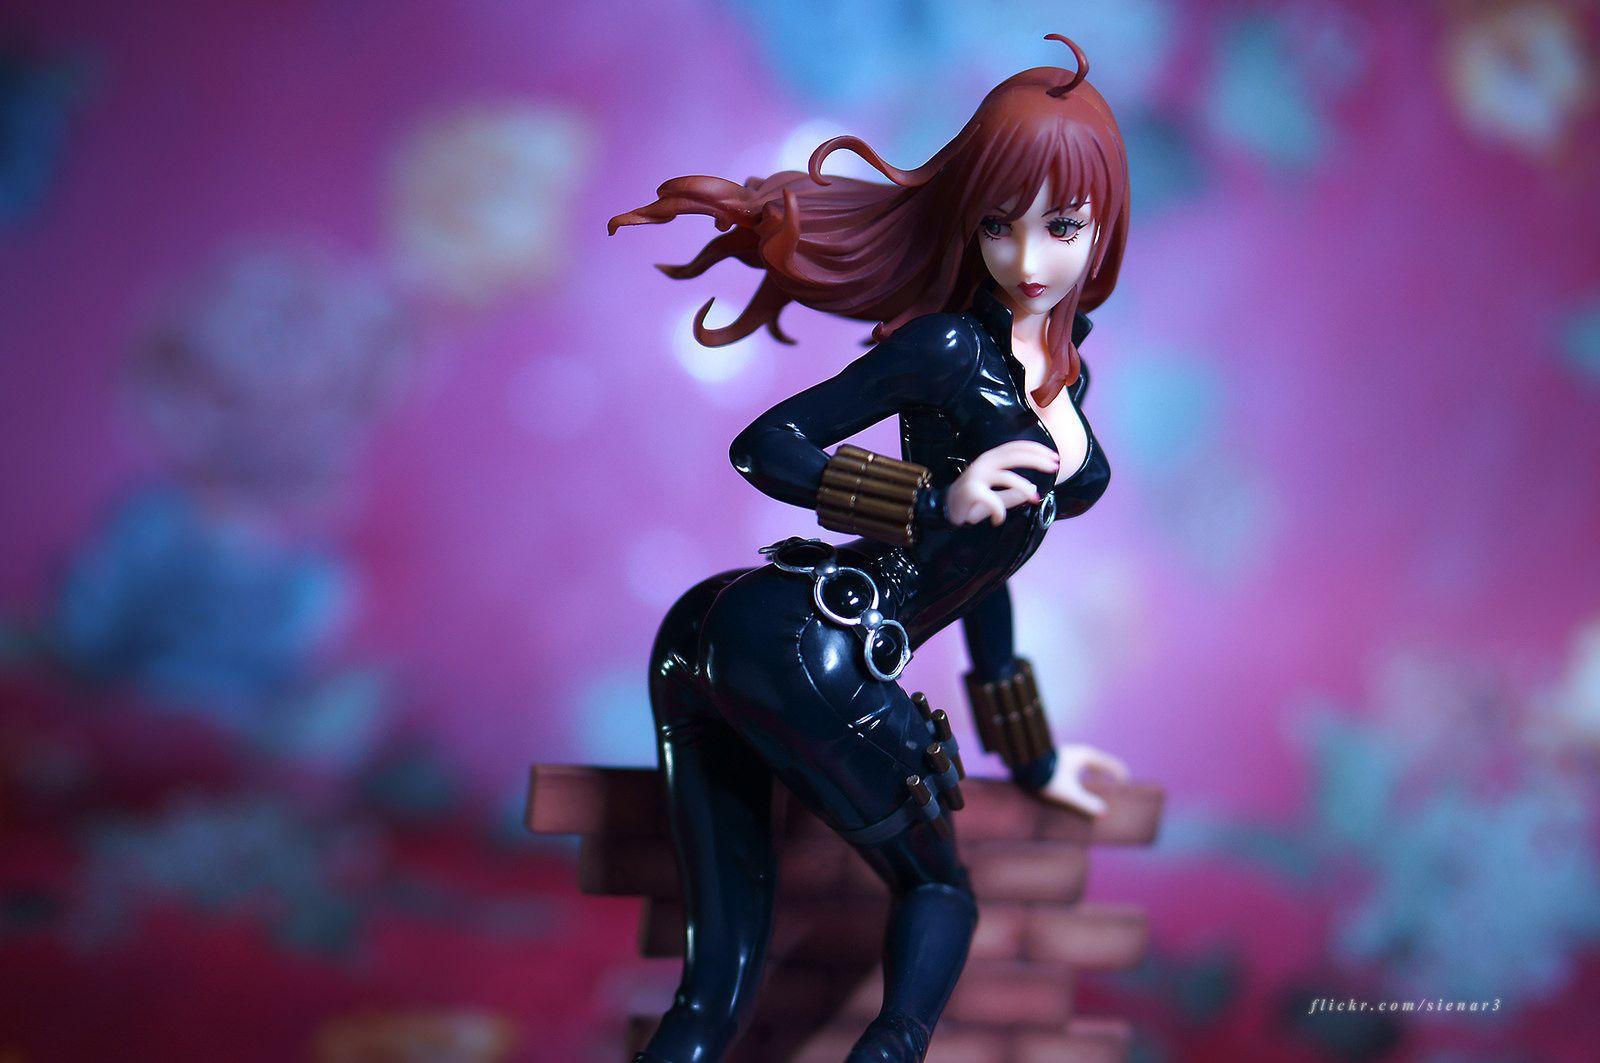 Kotobukiya Black Widow DSC07198 | by sienar3